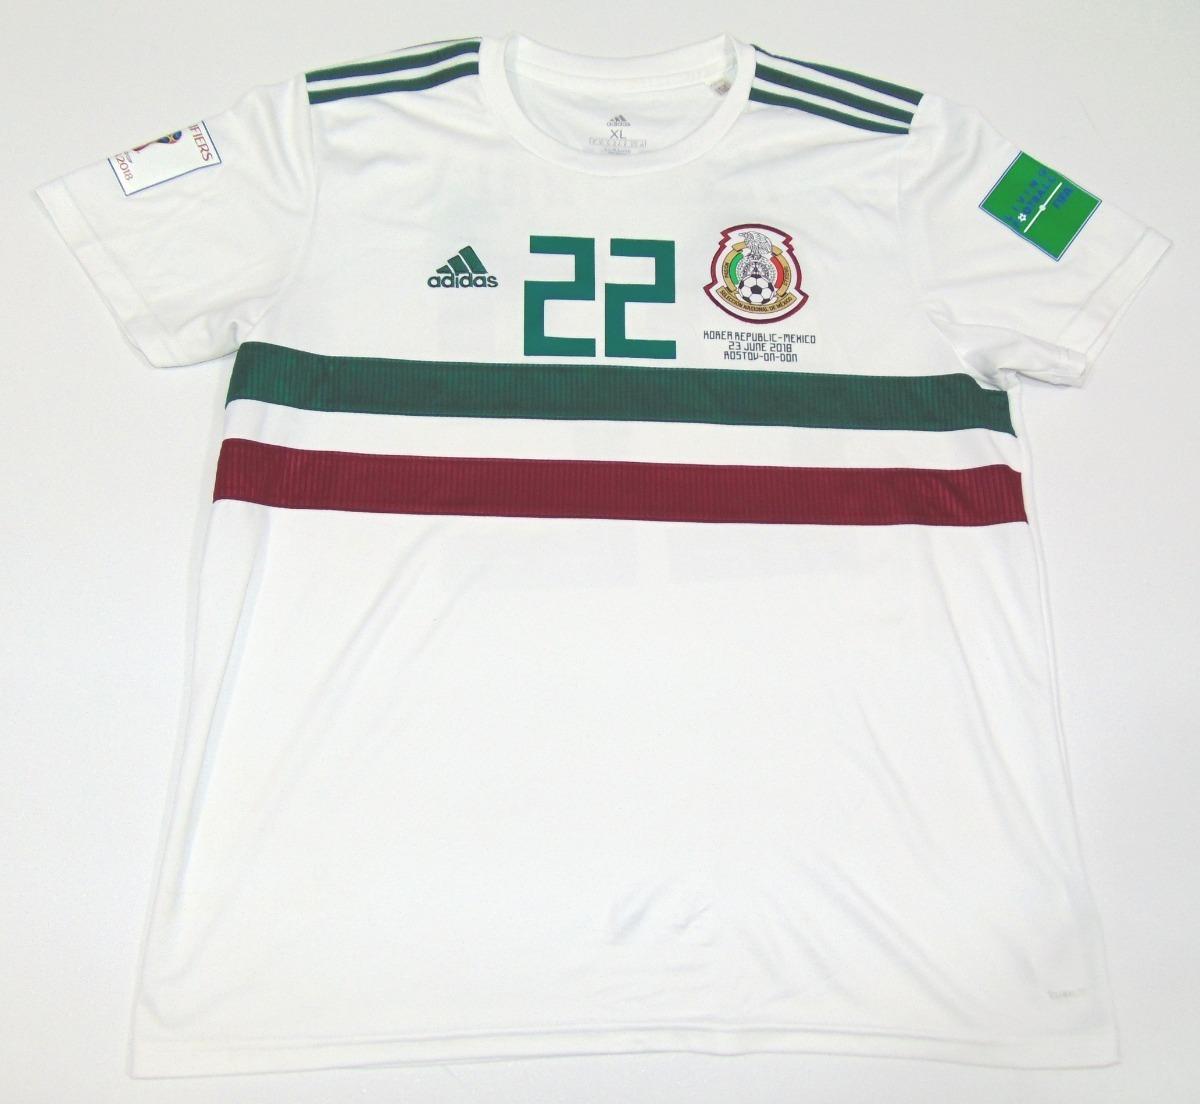 wholesale dealer 1c822 fceea Jersey Mexico Wc 2018 Hirving Lozano Visita adidas Pachuca Napoli Psv